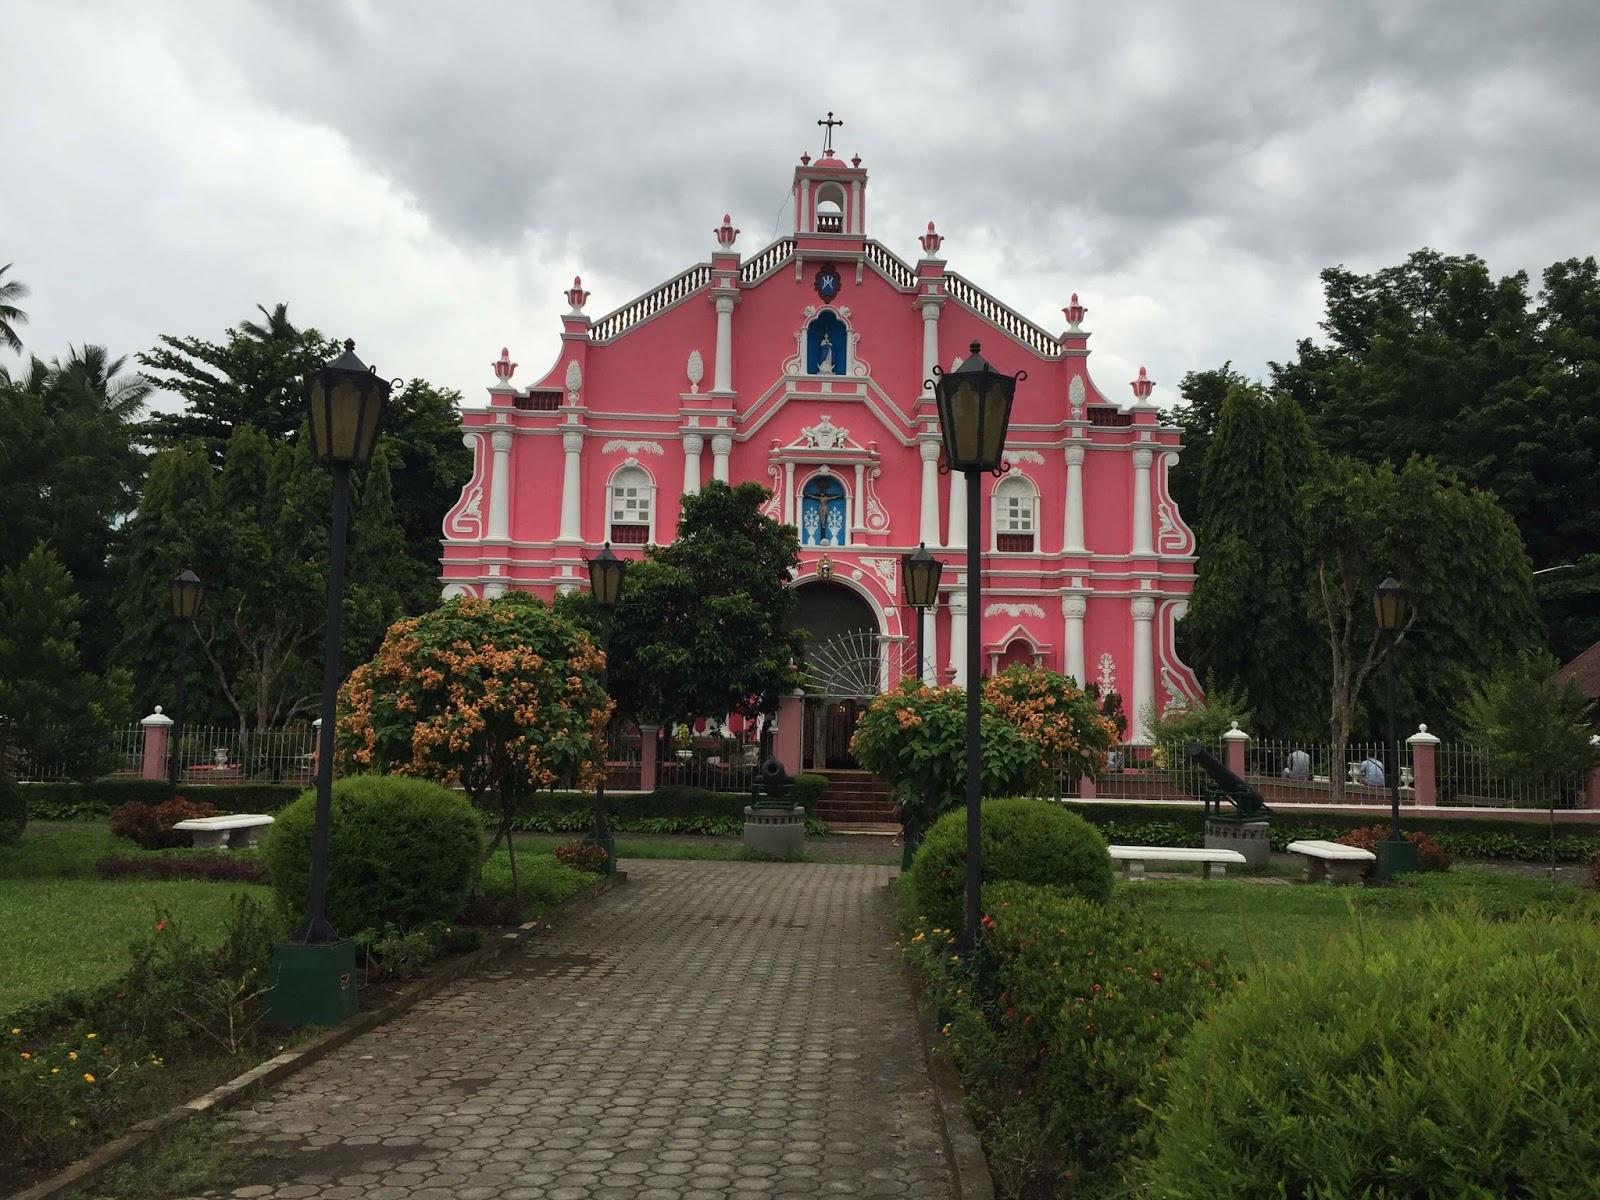 Elle 39 s tinker toes july 2016 Villa escudero quezon province